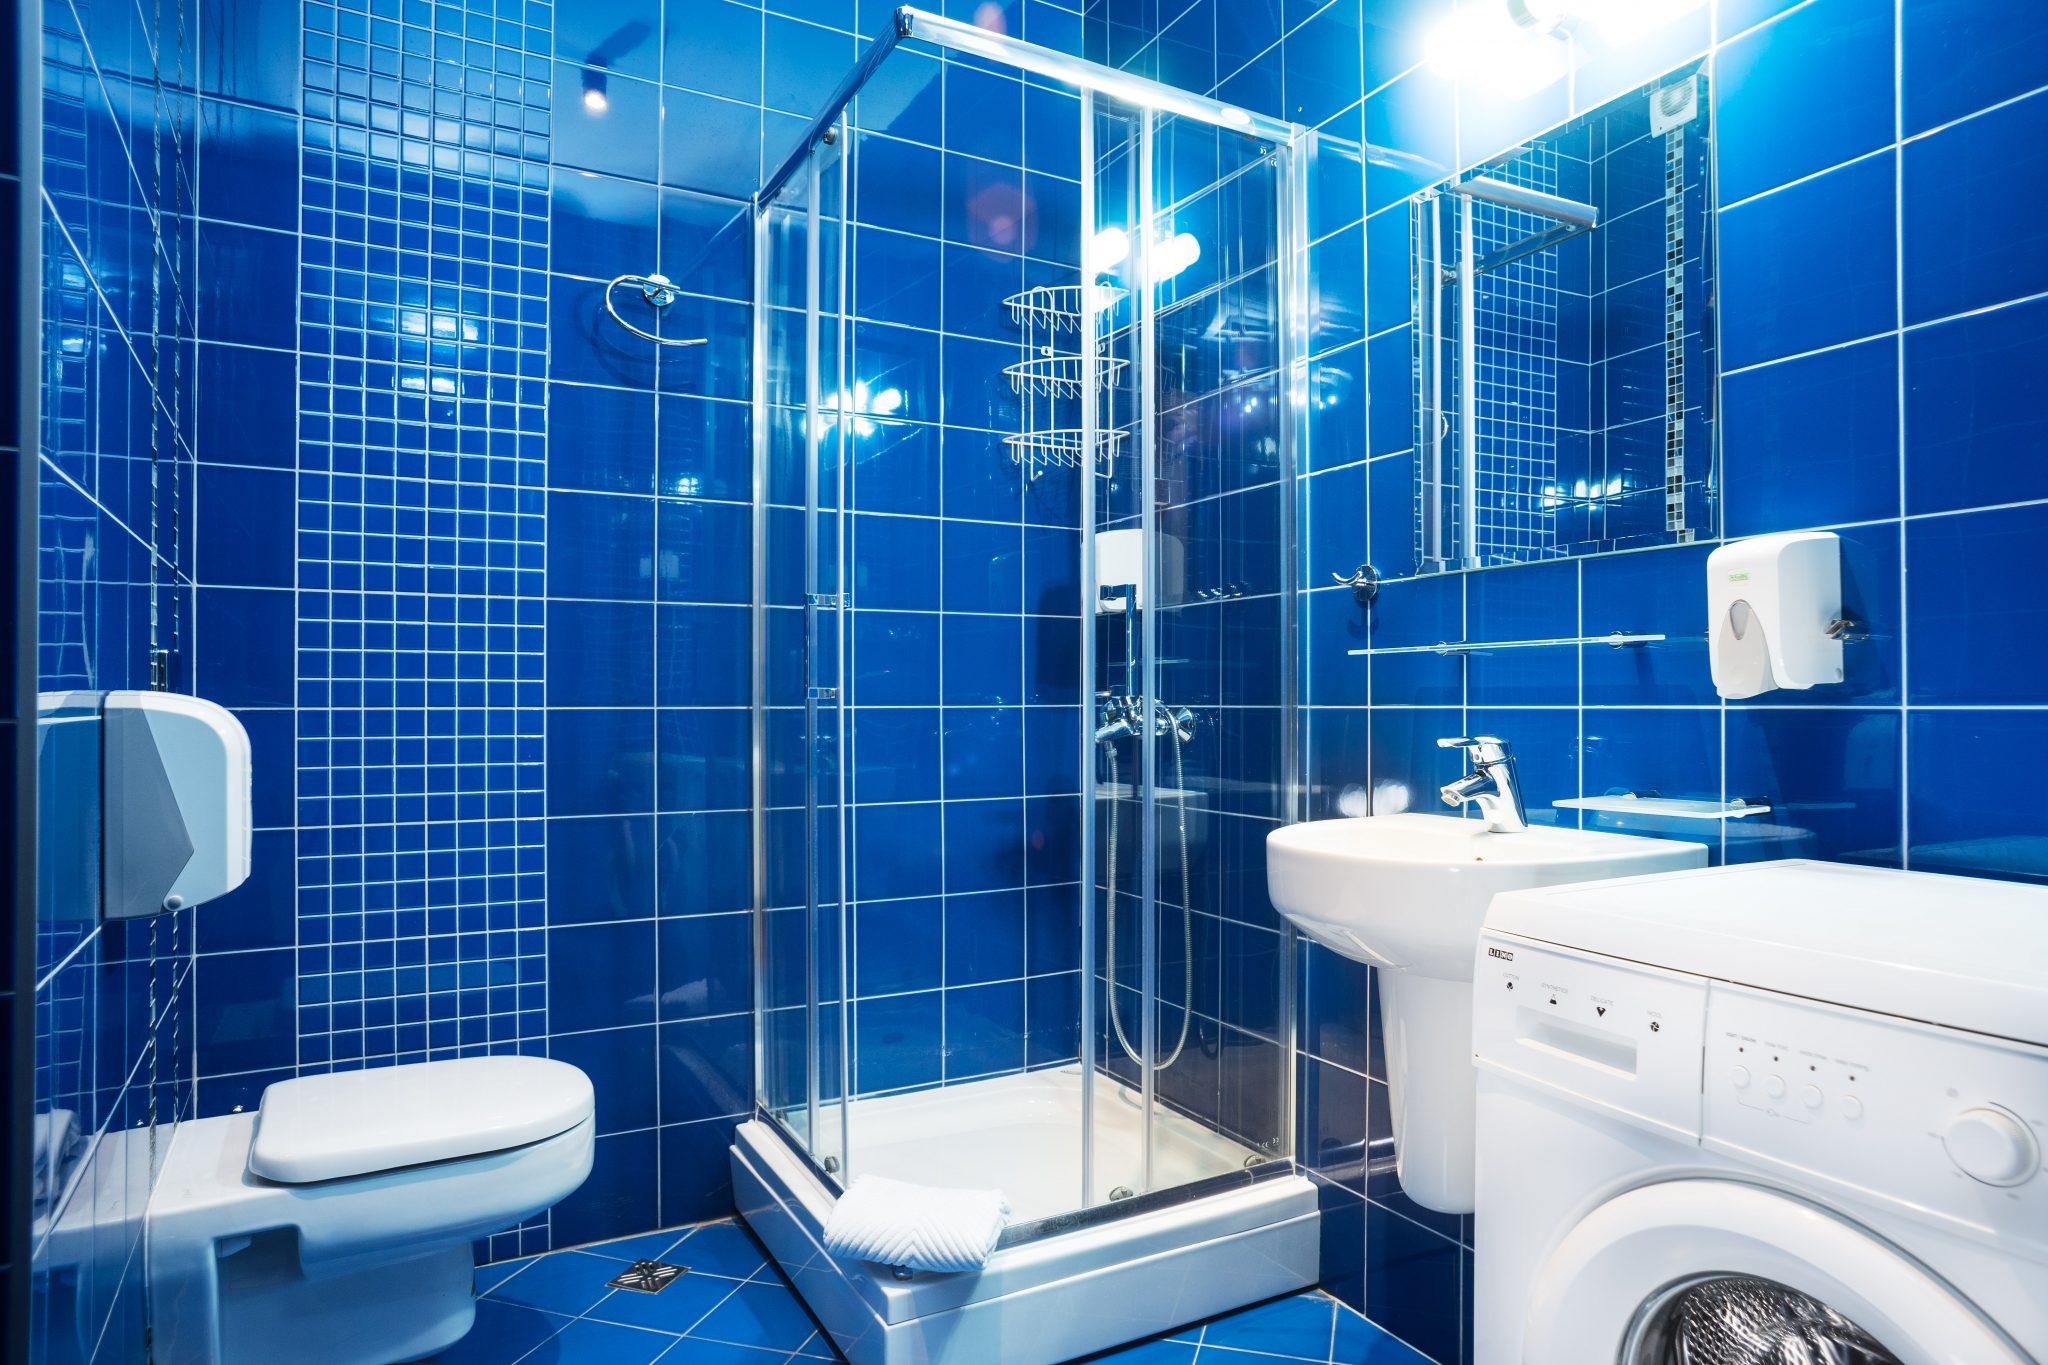 apartmani-u-beogradu-kupatilo